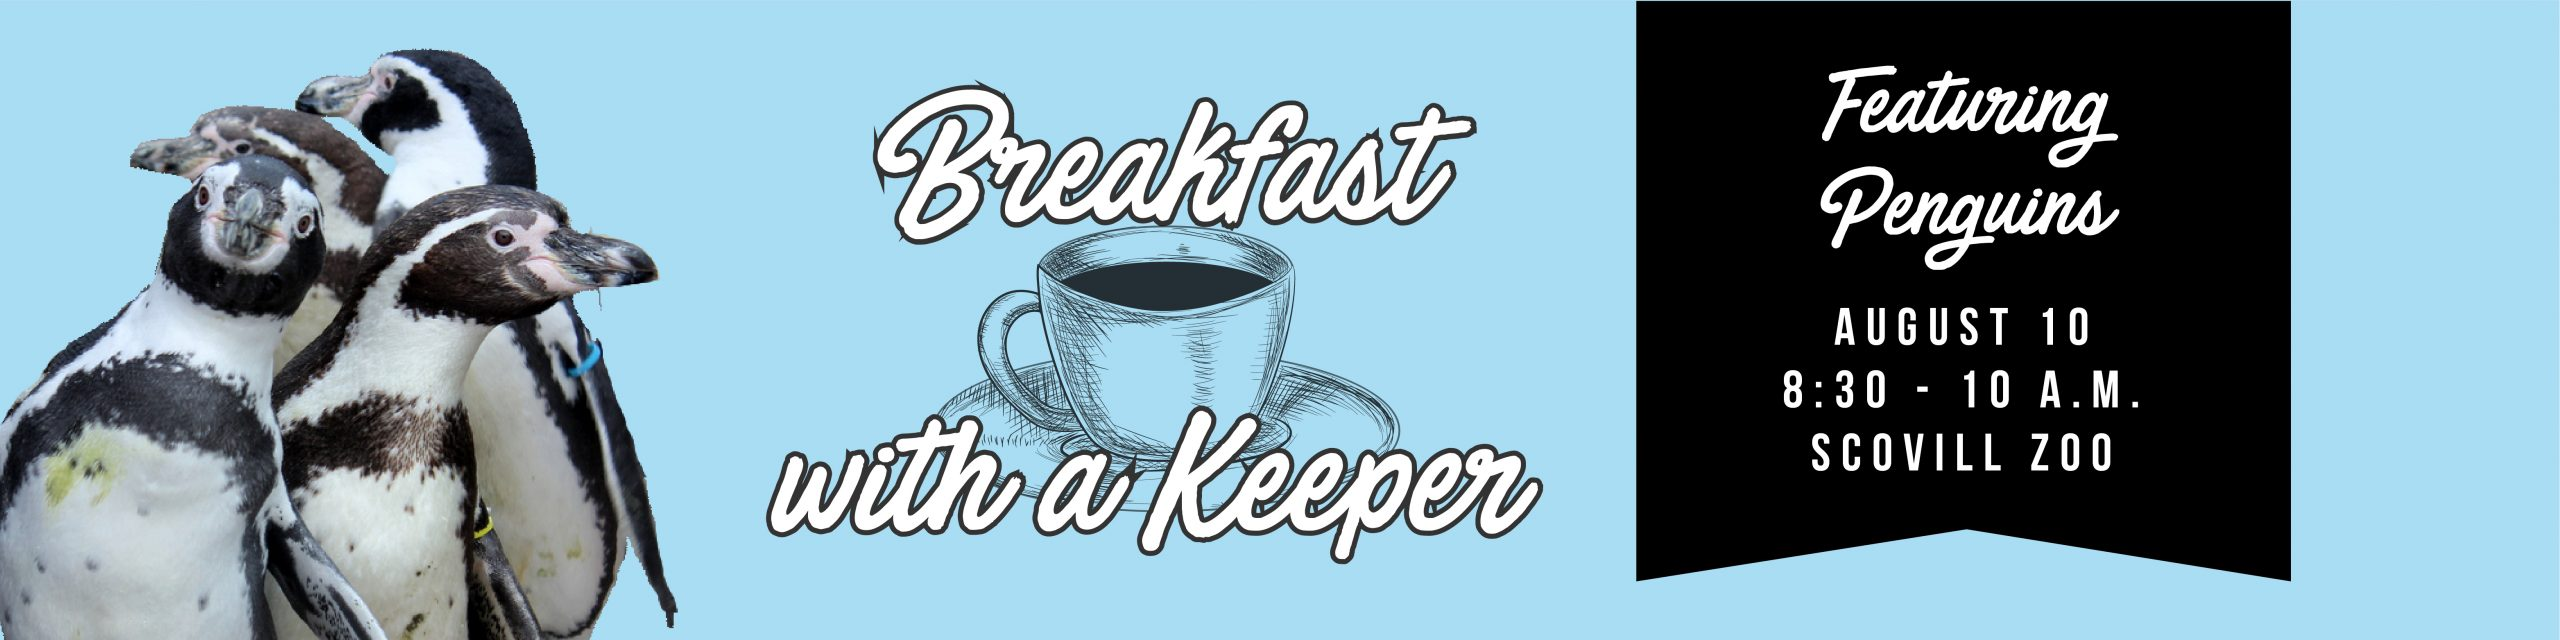 Breakfast_Keeper-Banners_Penguins-03